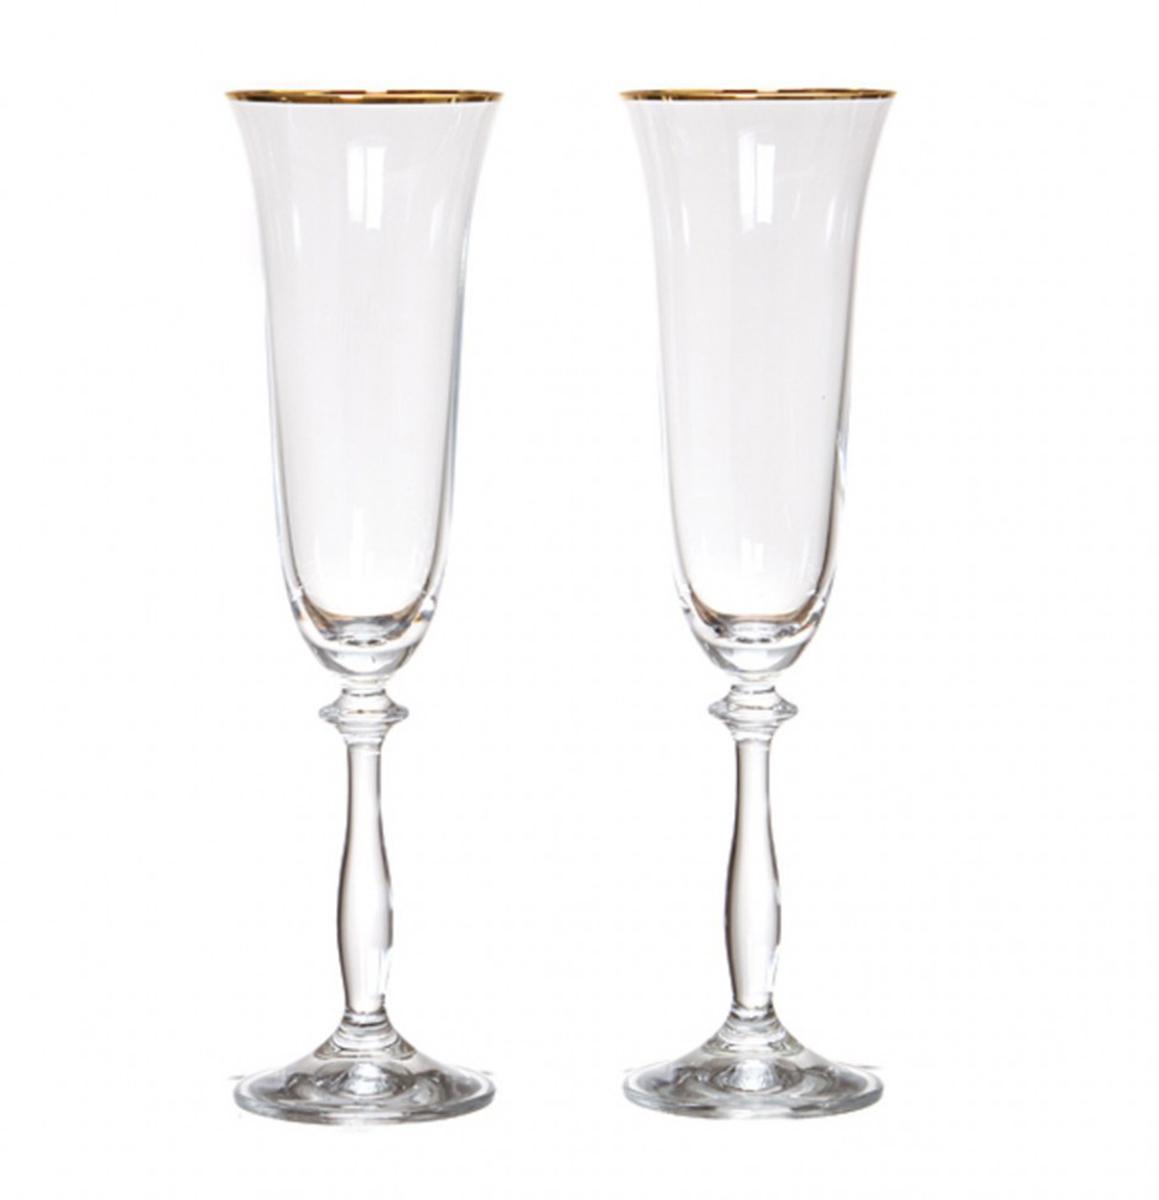 Набор бокалов для шампанского Bohemia Crystal Анжела, 190 мл, 2 шт. 40600/20787/190/2 bohemia crystal набор бокалов для шампанского felina 25 см 2 шт